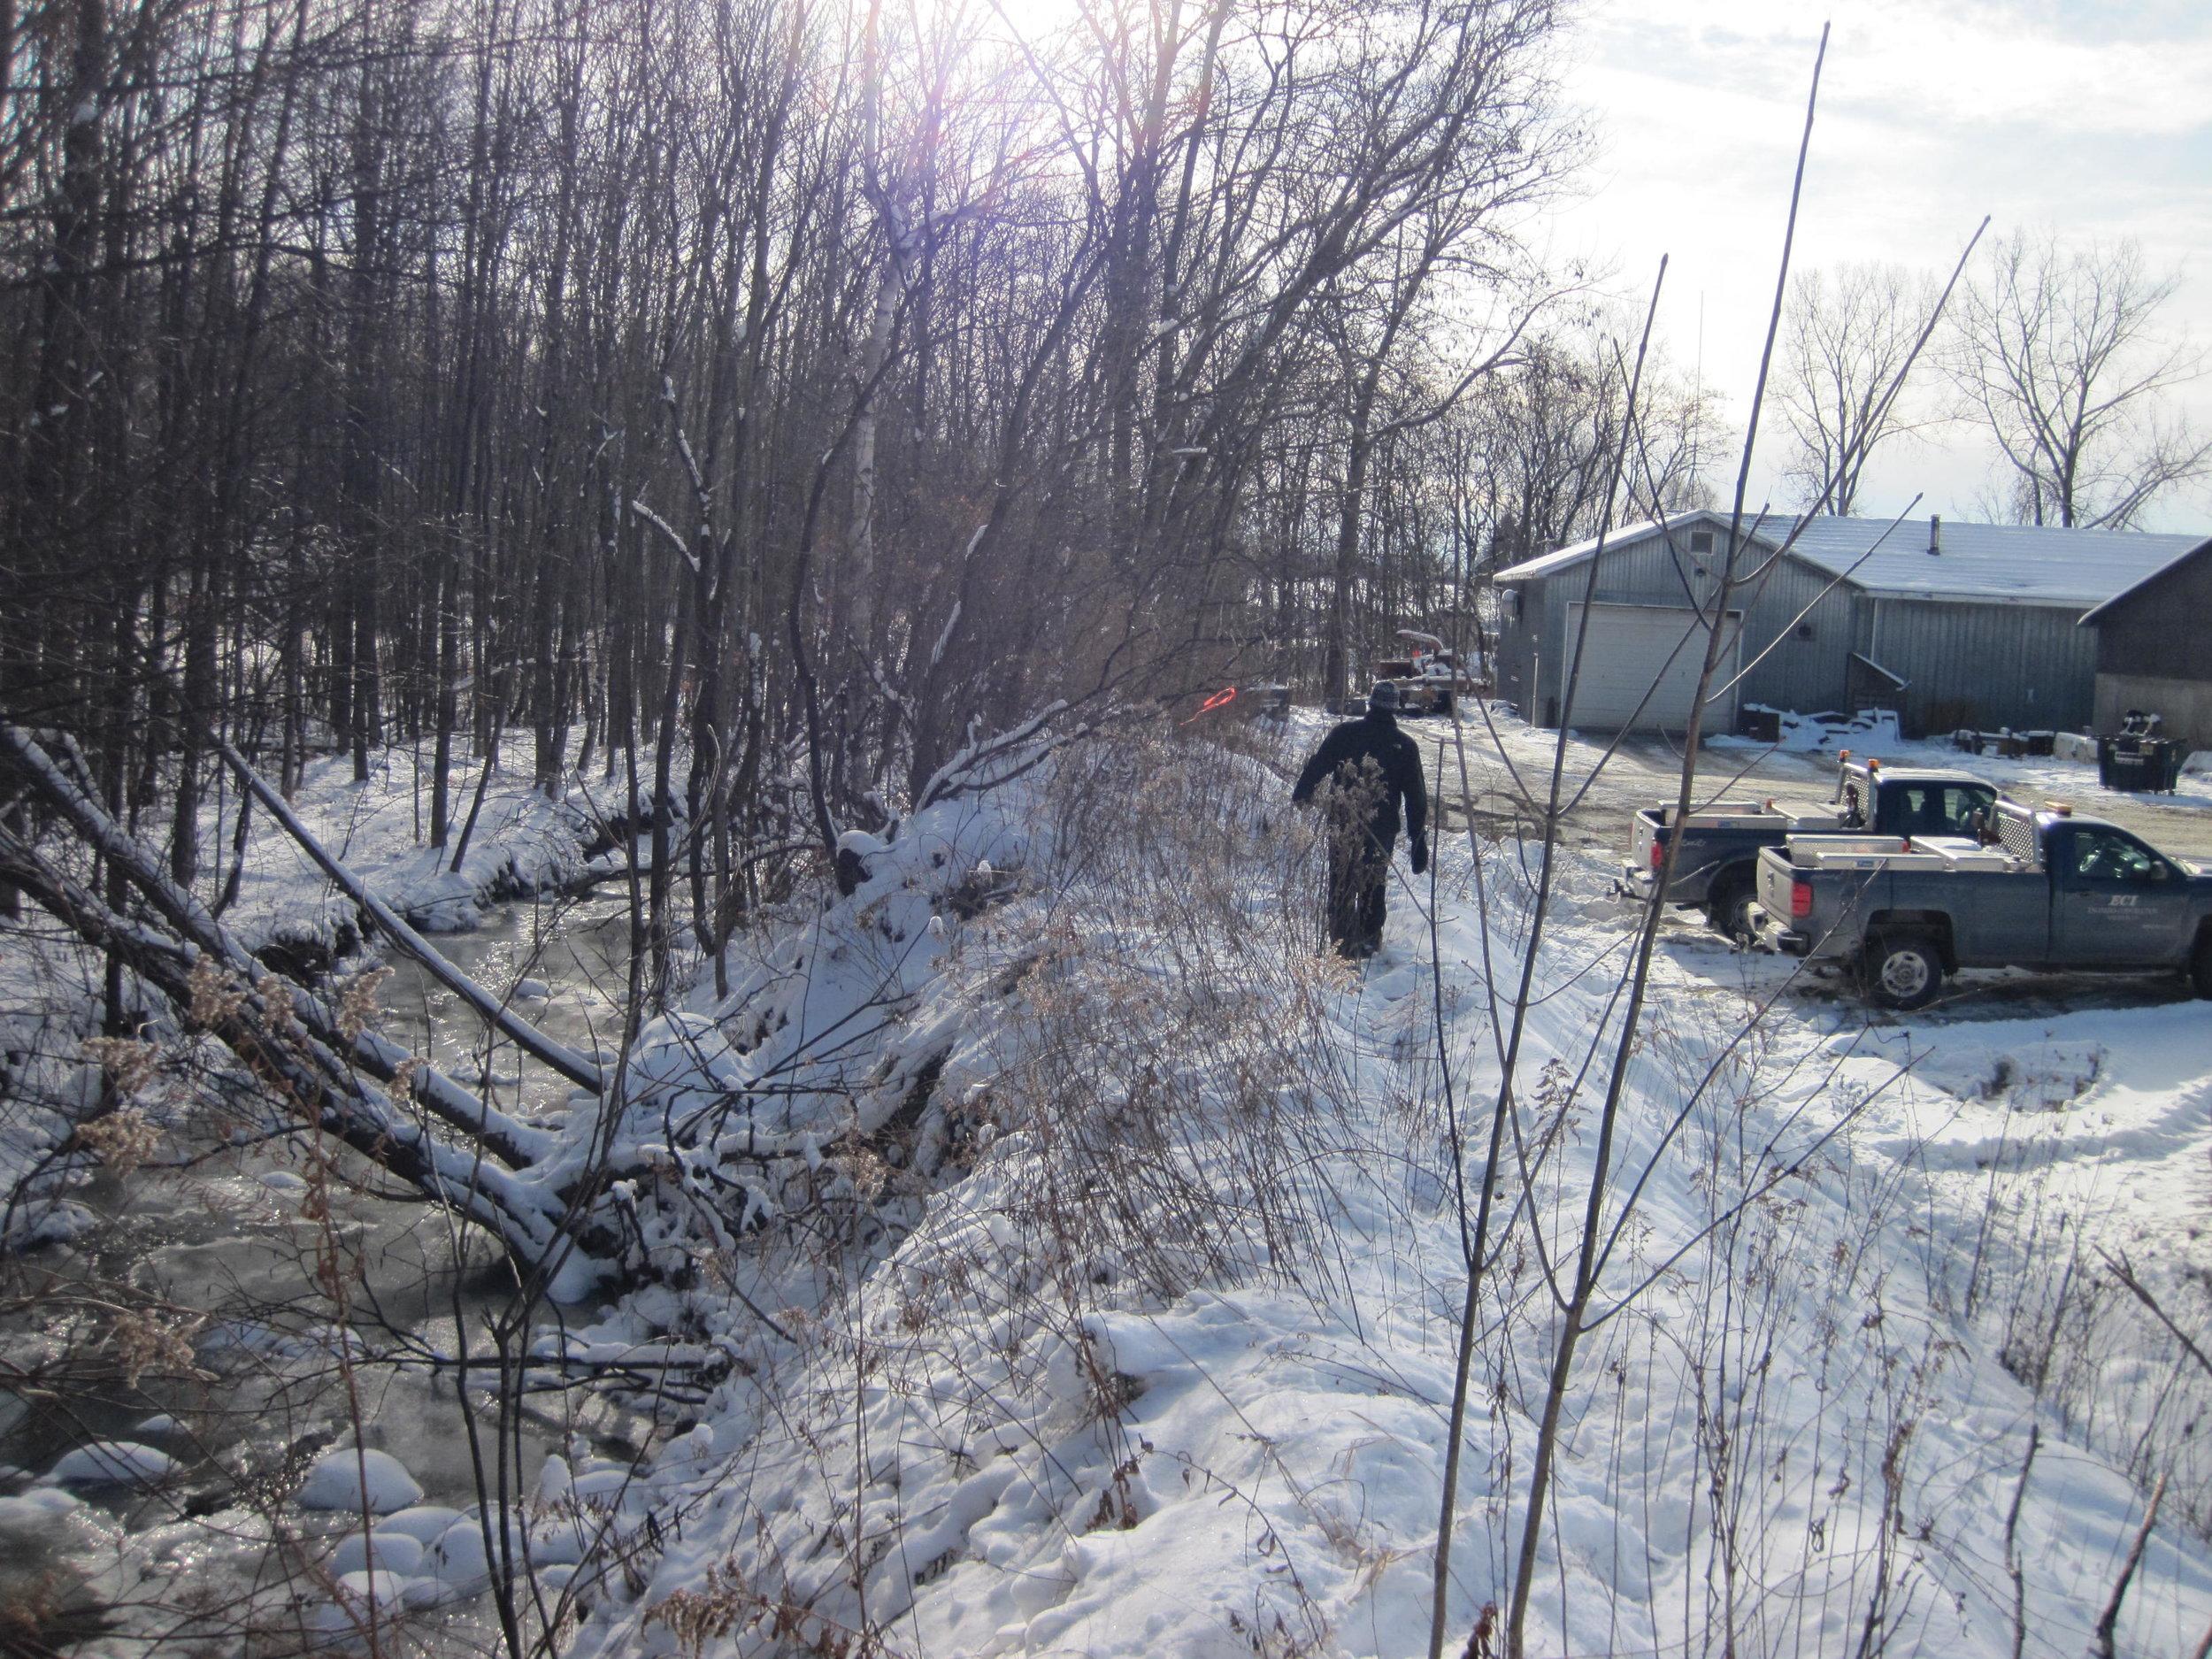 The berm between the Hinesburg garage site and Beecher Hill Brook